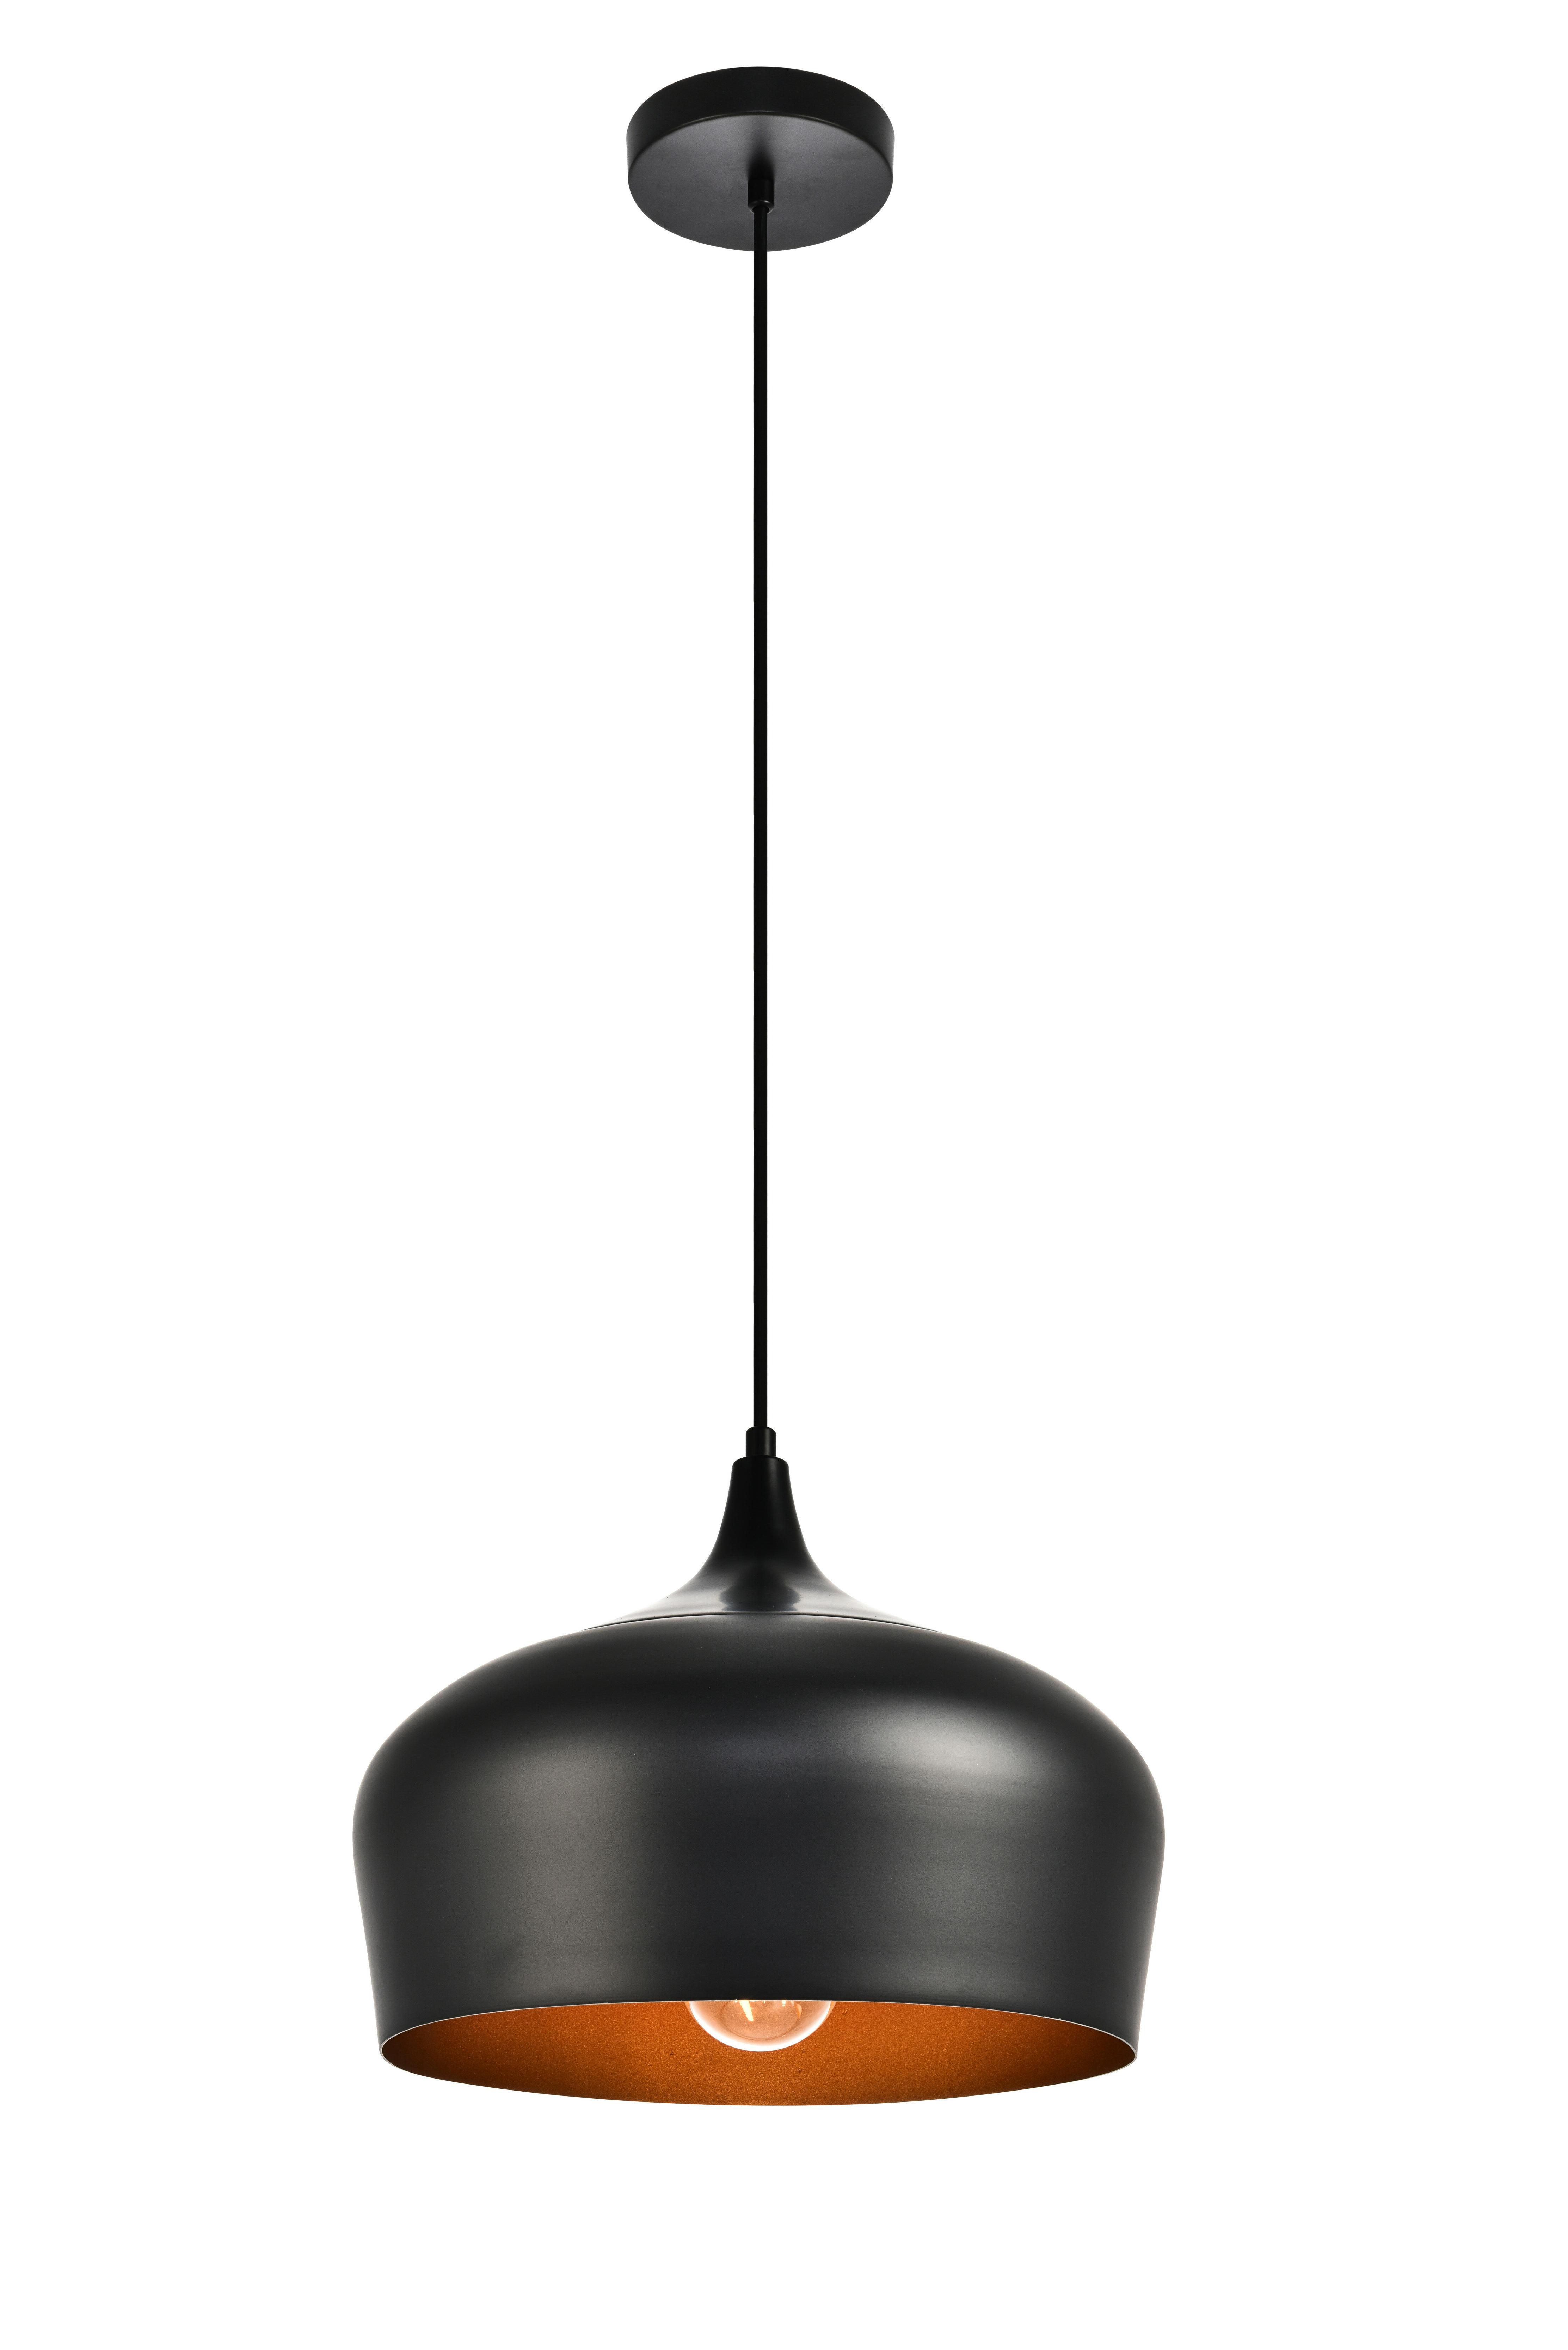 Recent Adriana Black 1 Light Single Dome Pendants Throughout Jordan 1 Light Single Teardrop Pendant (View 19 of 20)